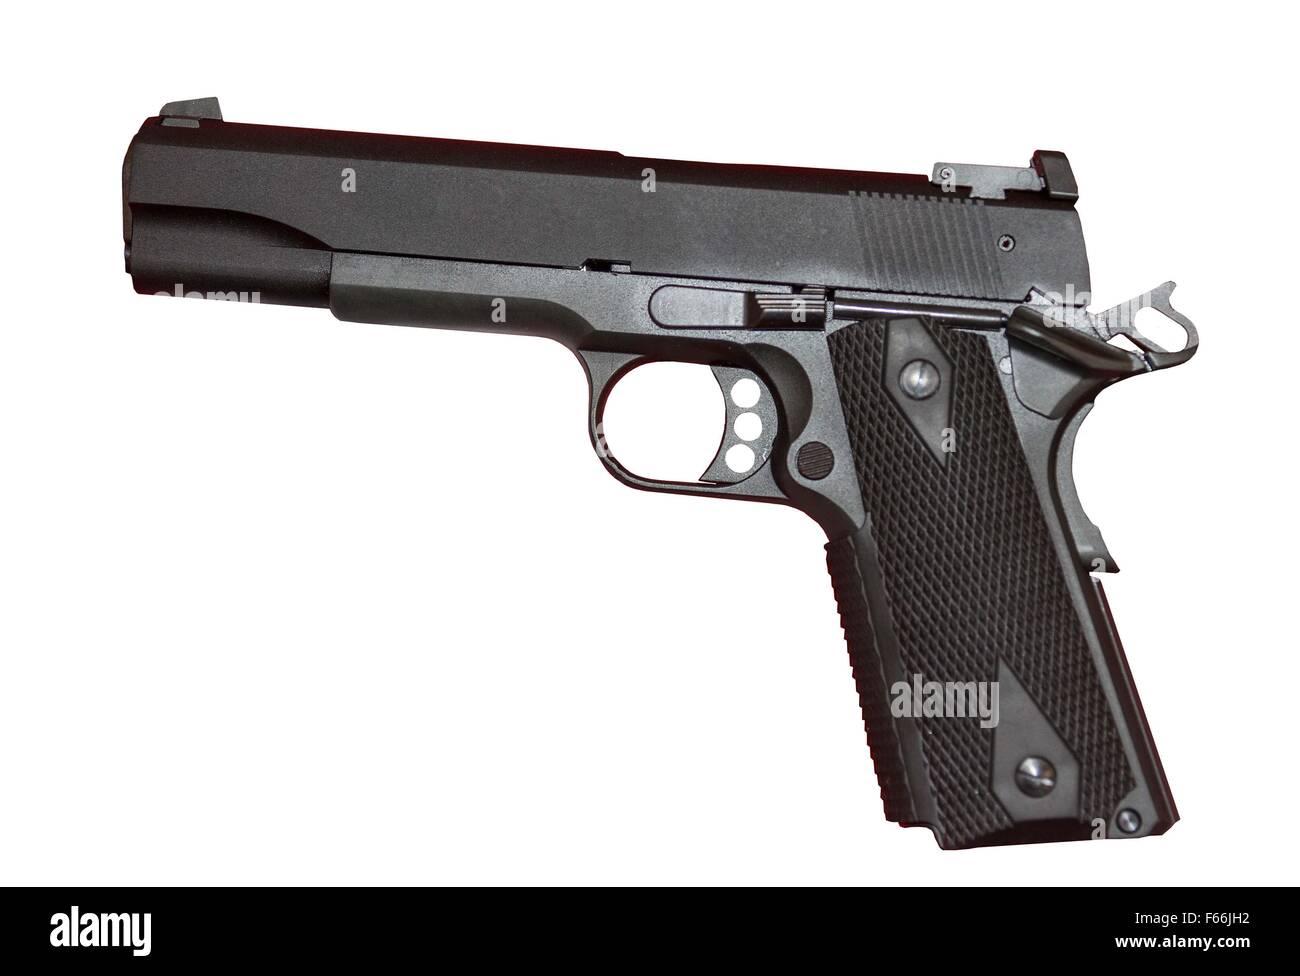 Colt 22 cal. automatic pistol.  Colt Gold Cup Trophy model. - Stock Image